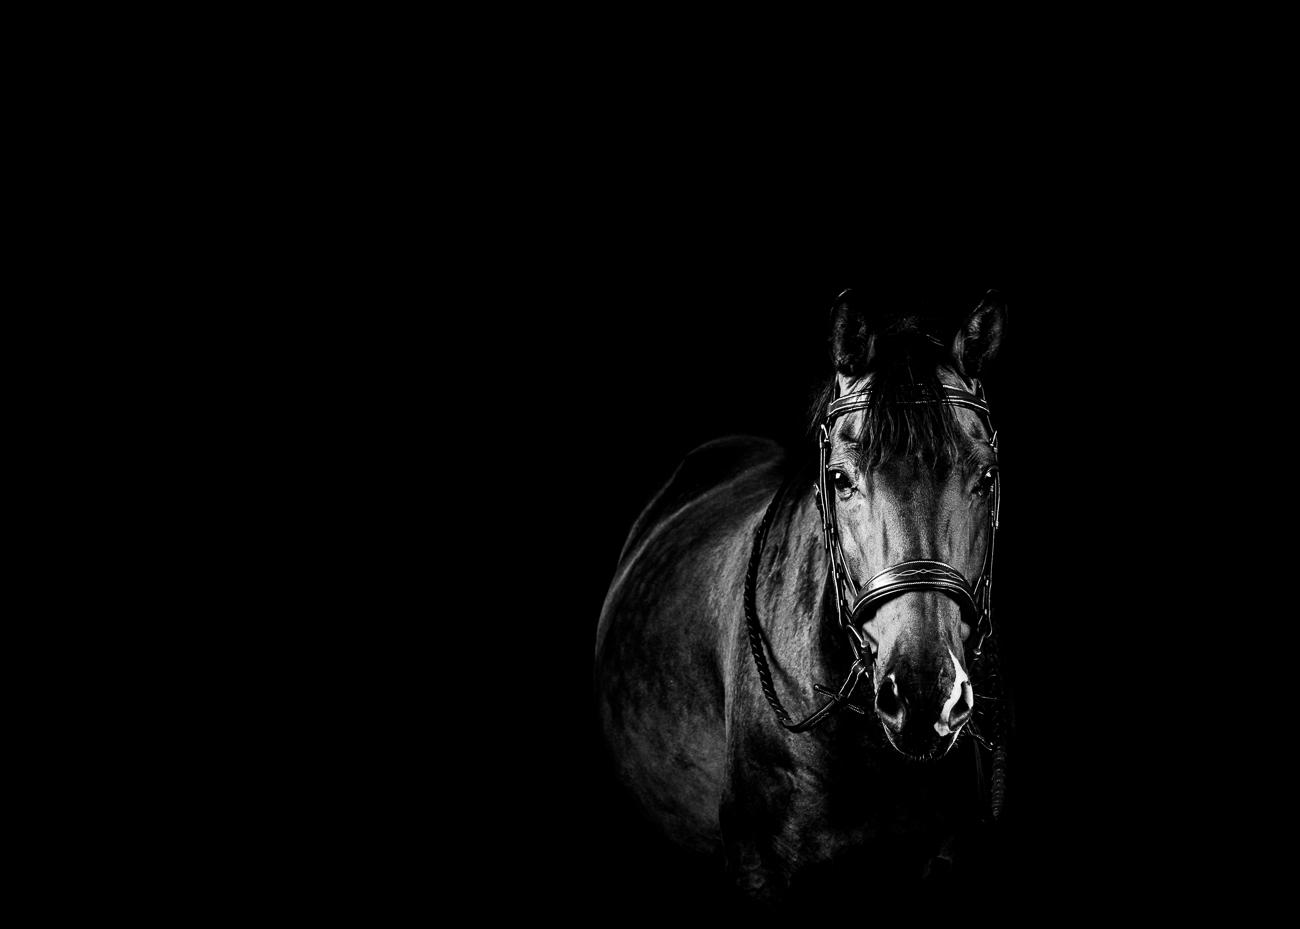 prestigio equestrian photo cheval noir et blanc